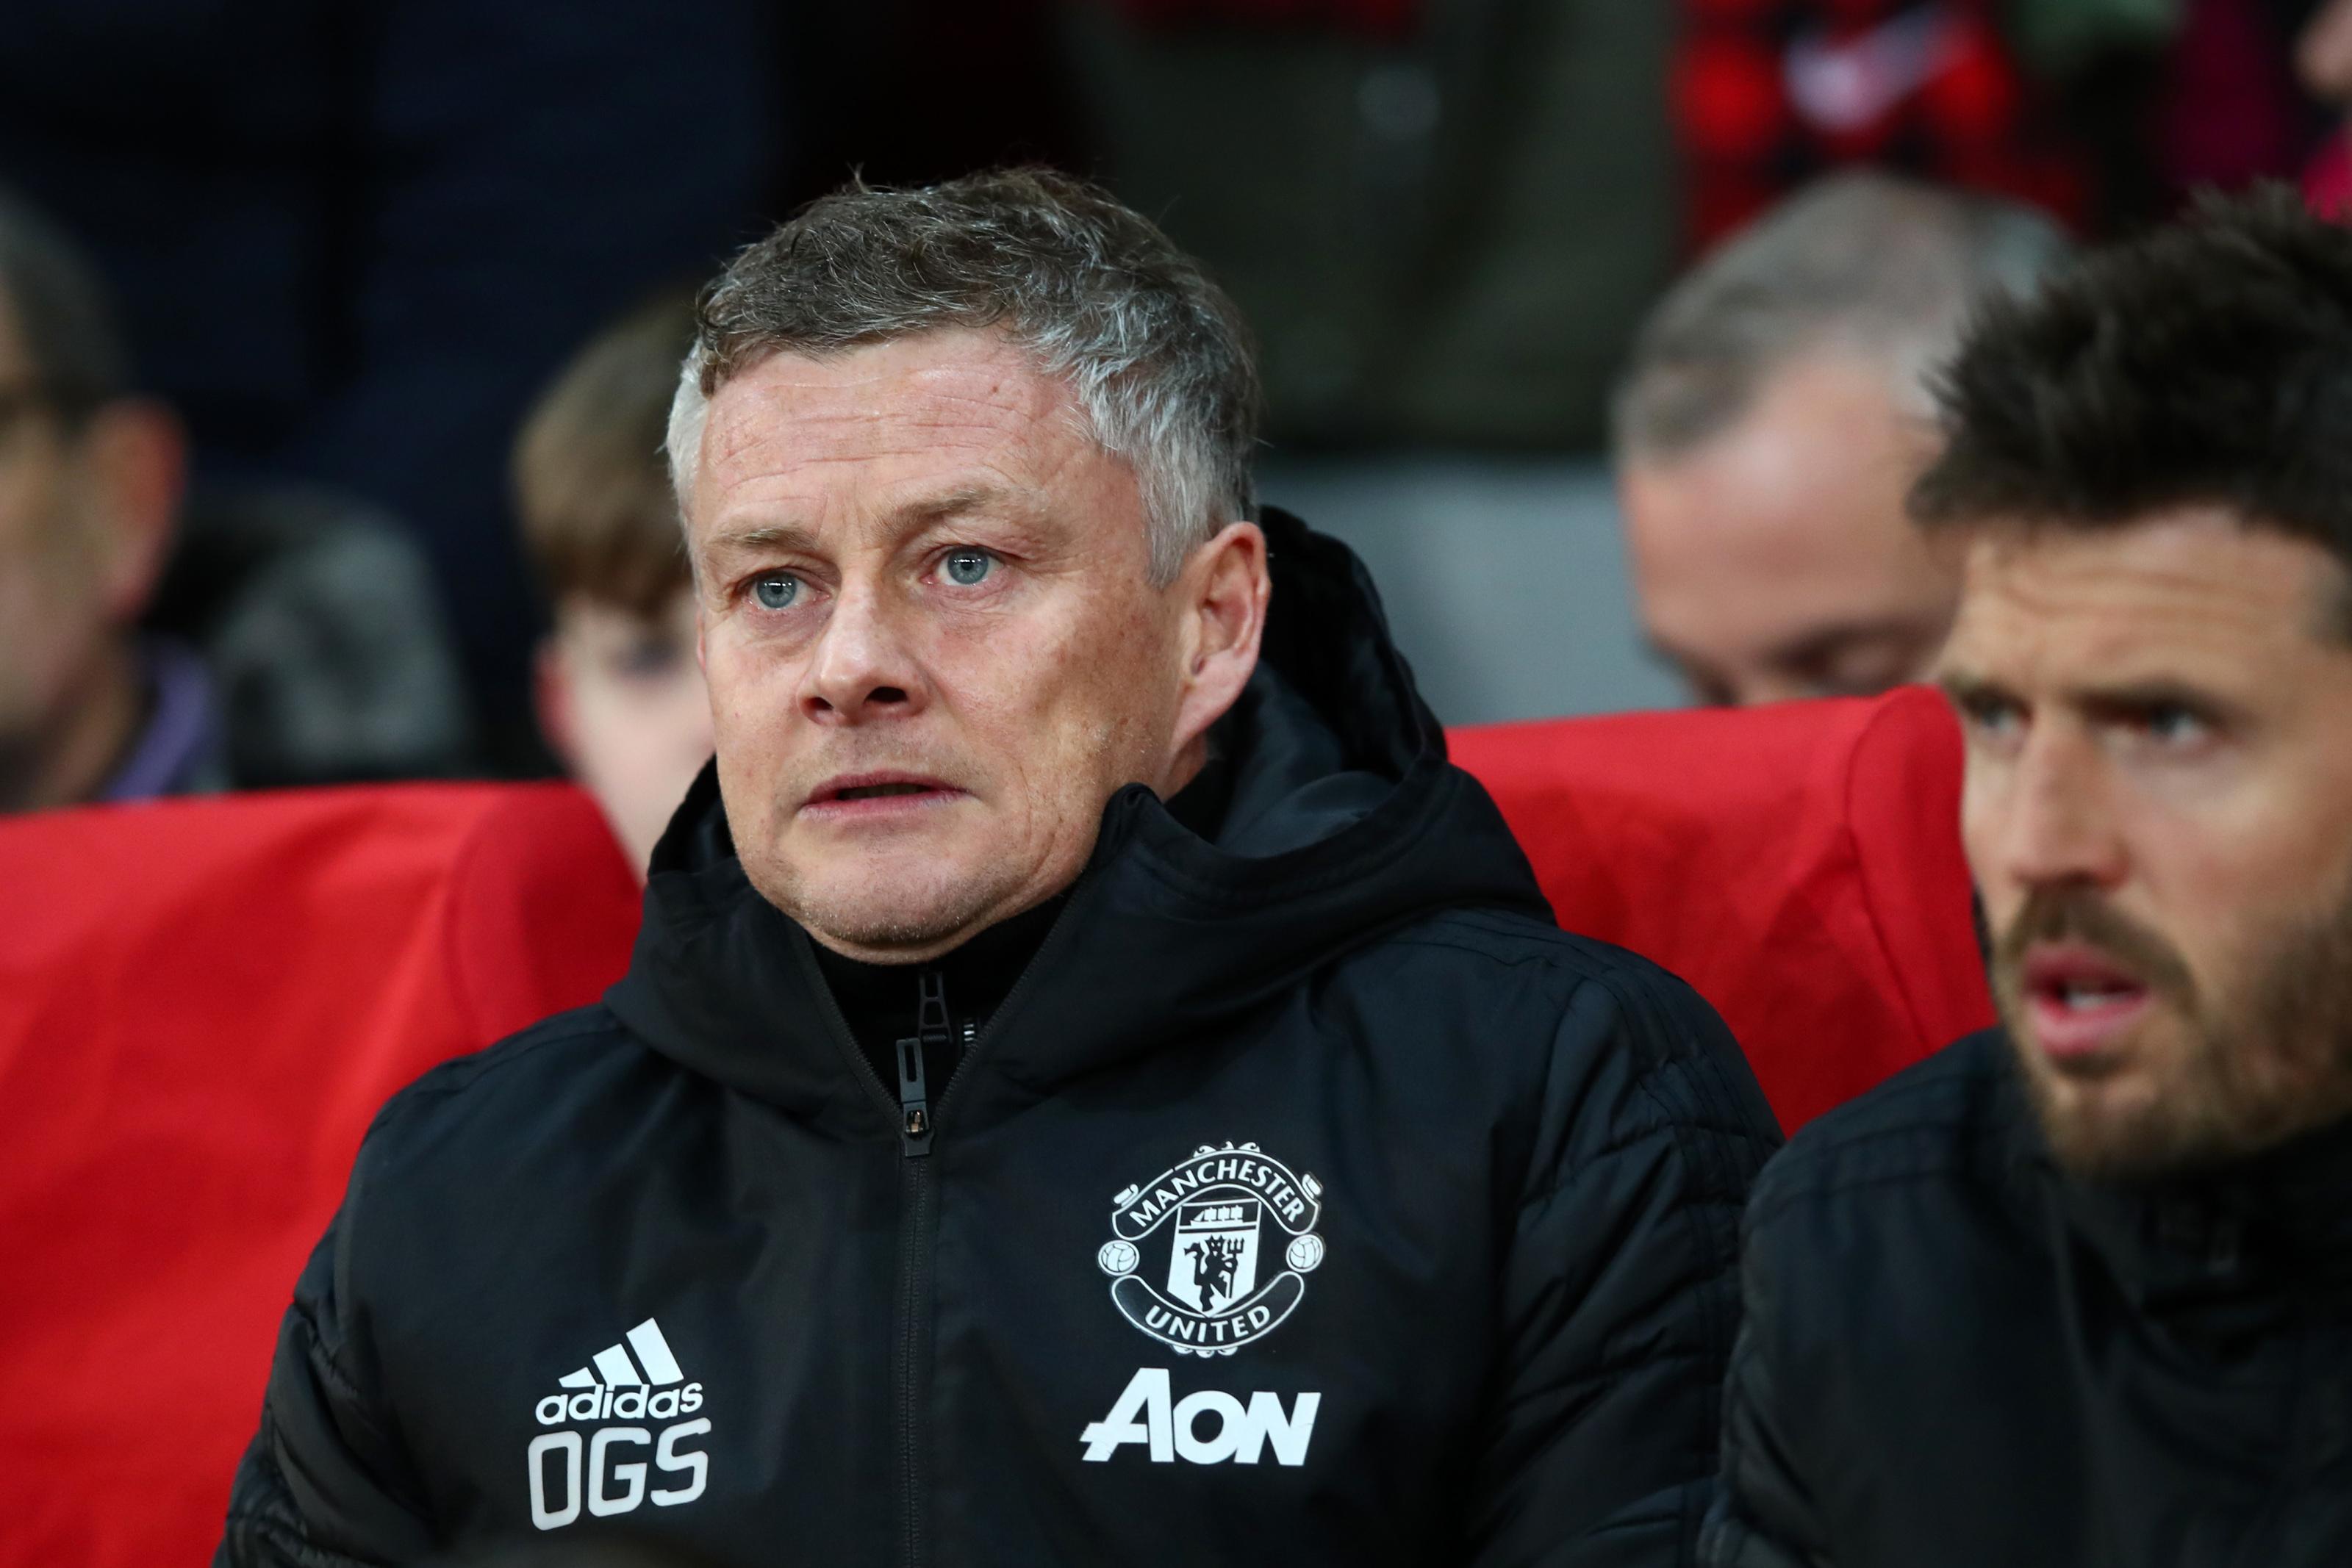 Manchester United: Solskjaer dealt major new injury blow